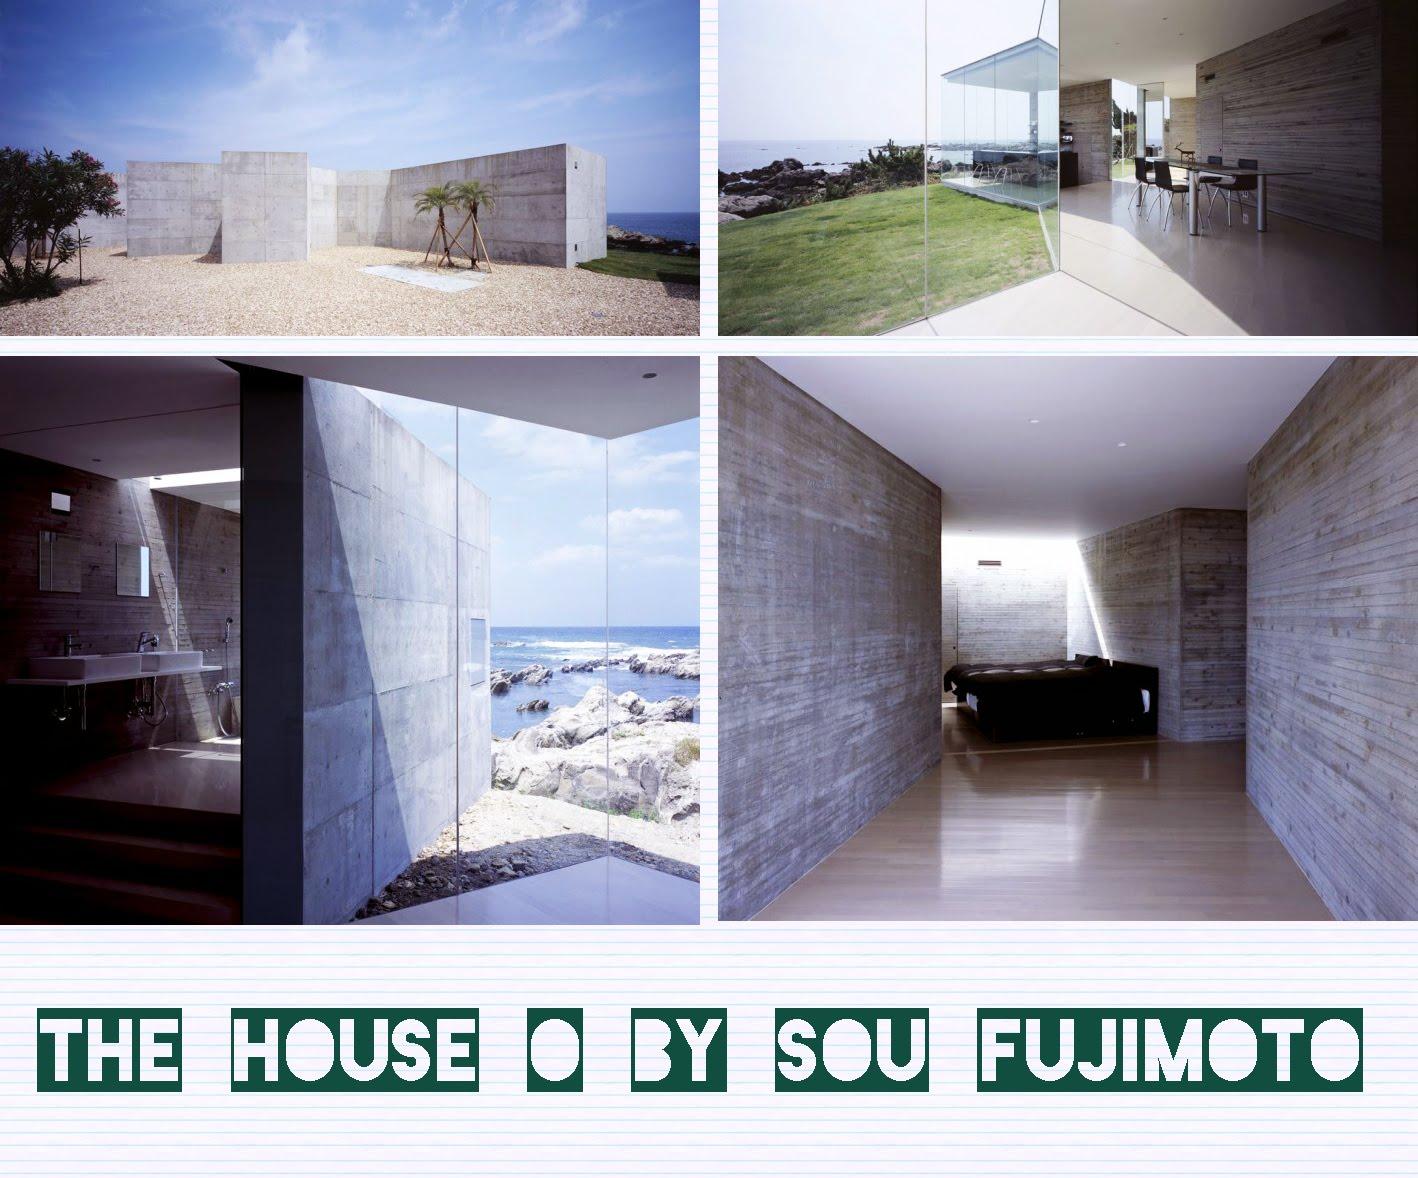 The house o by sou fujimoto so yum for O house sou fujimoto